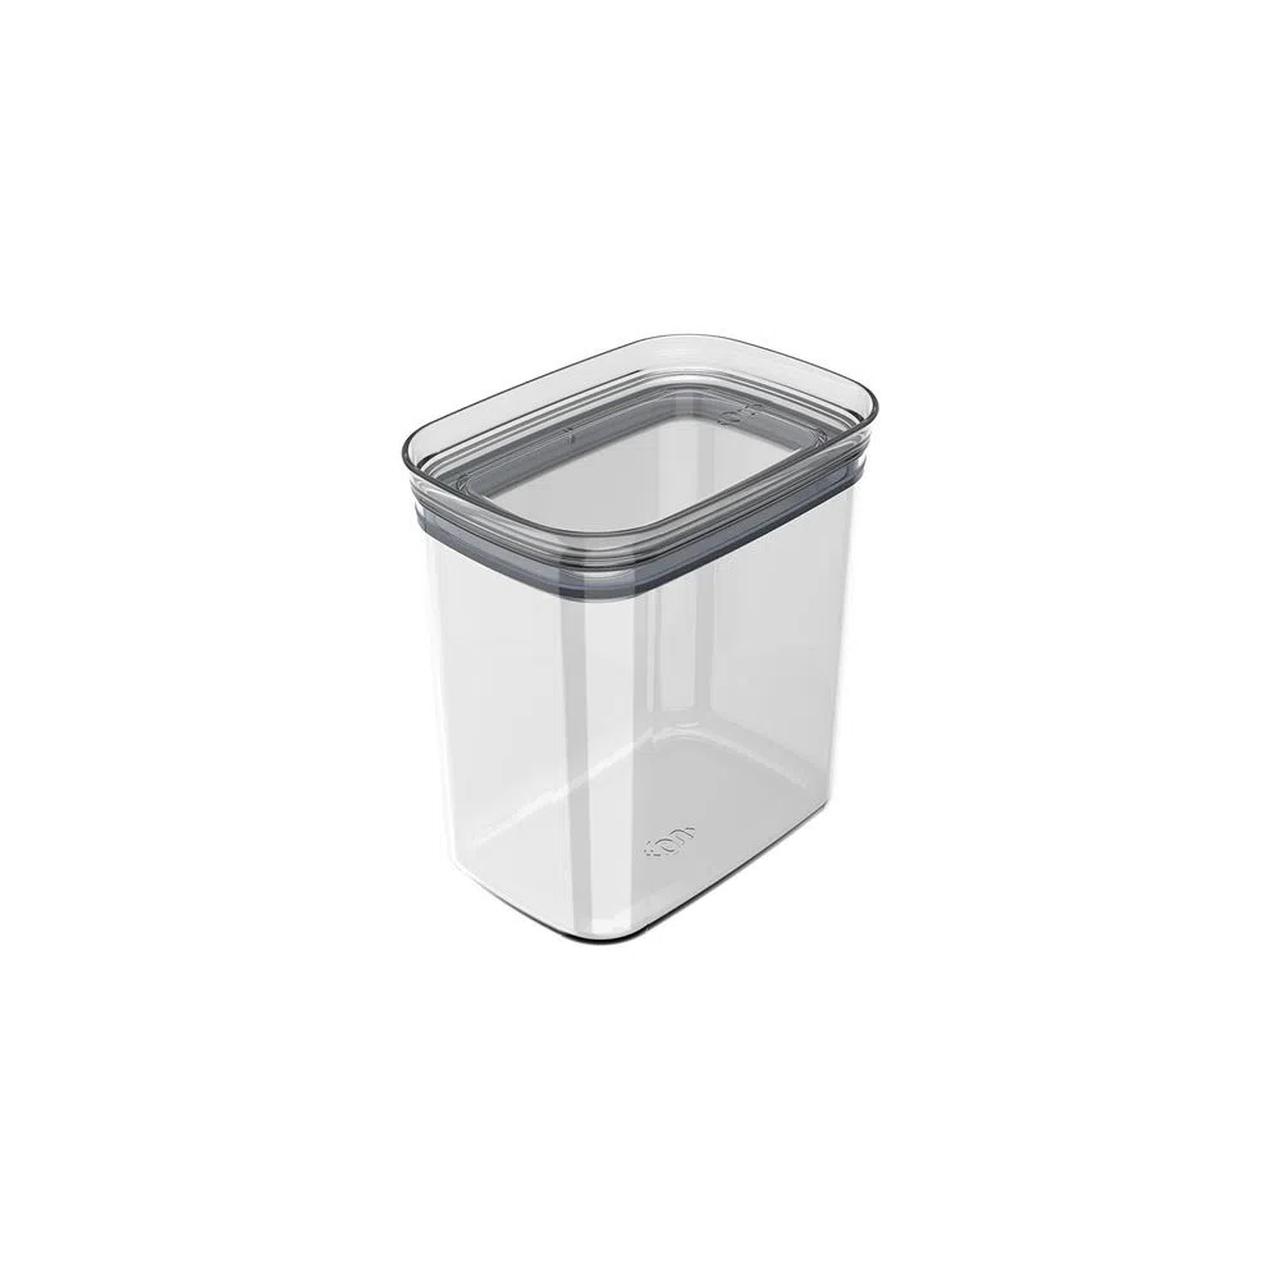 Pote Hermético Organizador - 1,5 Litros  - CASACOBRE